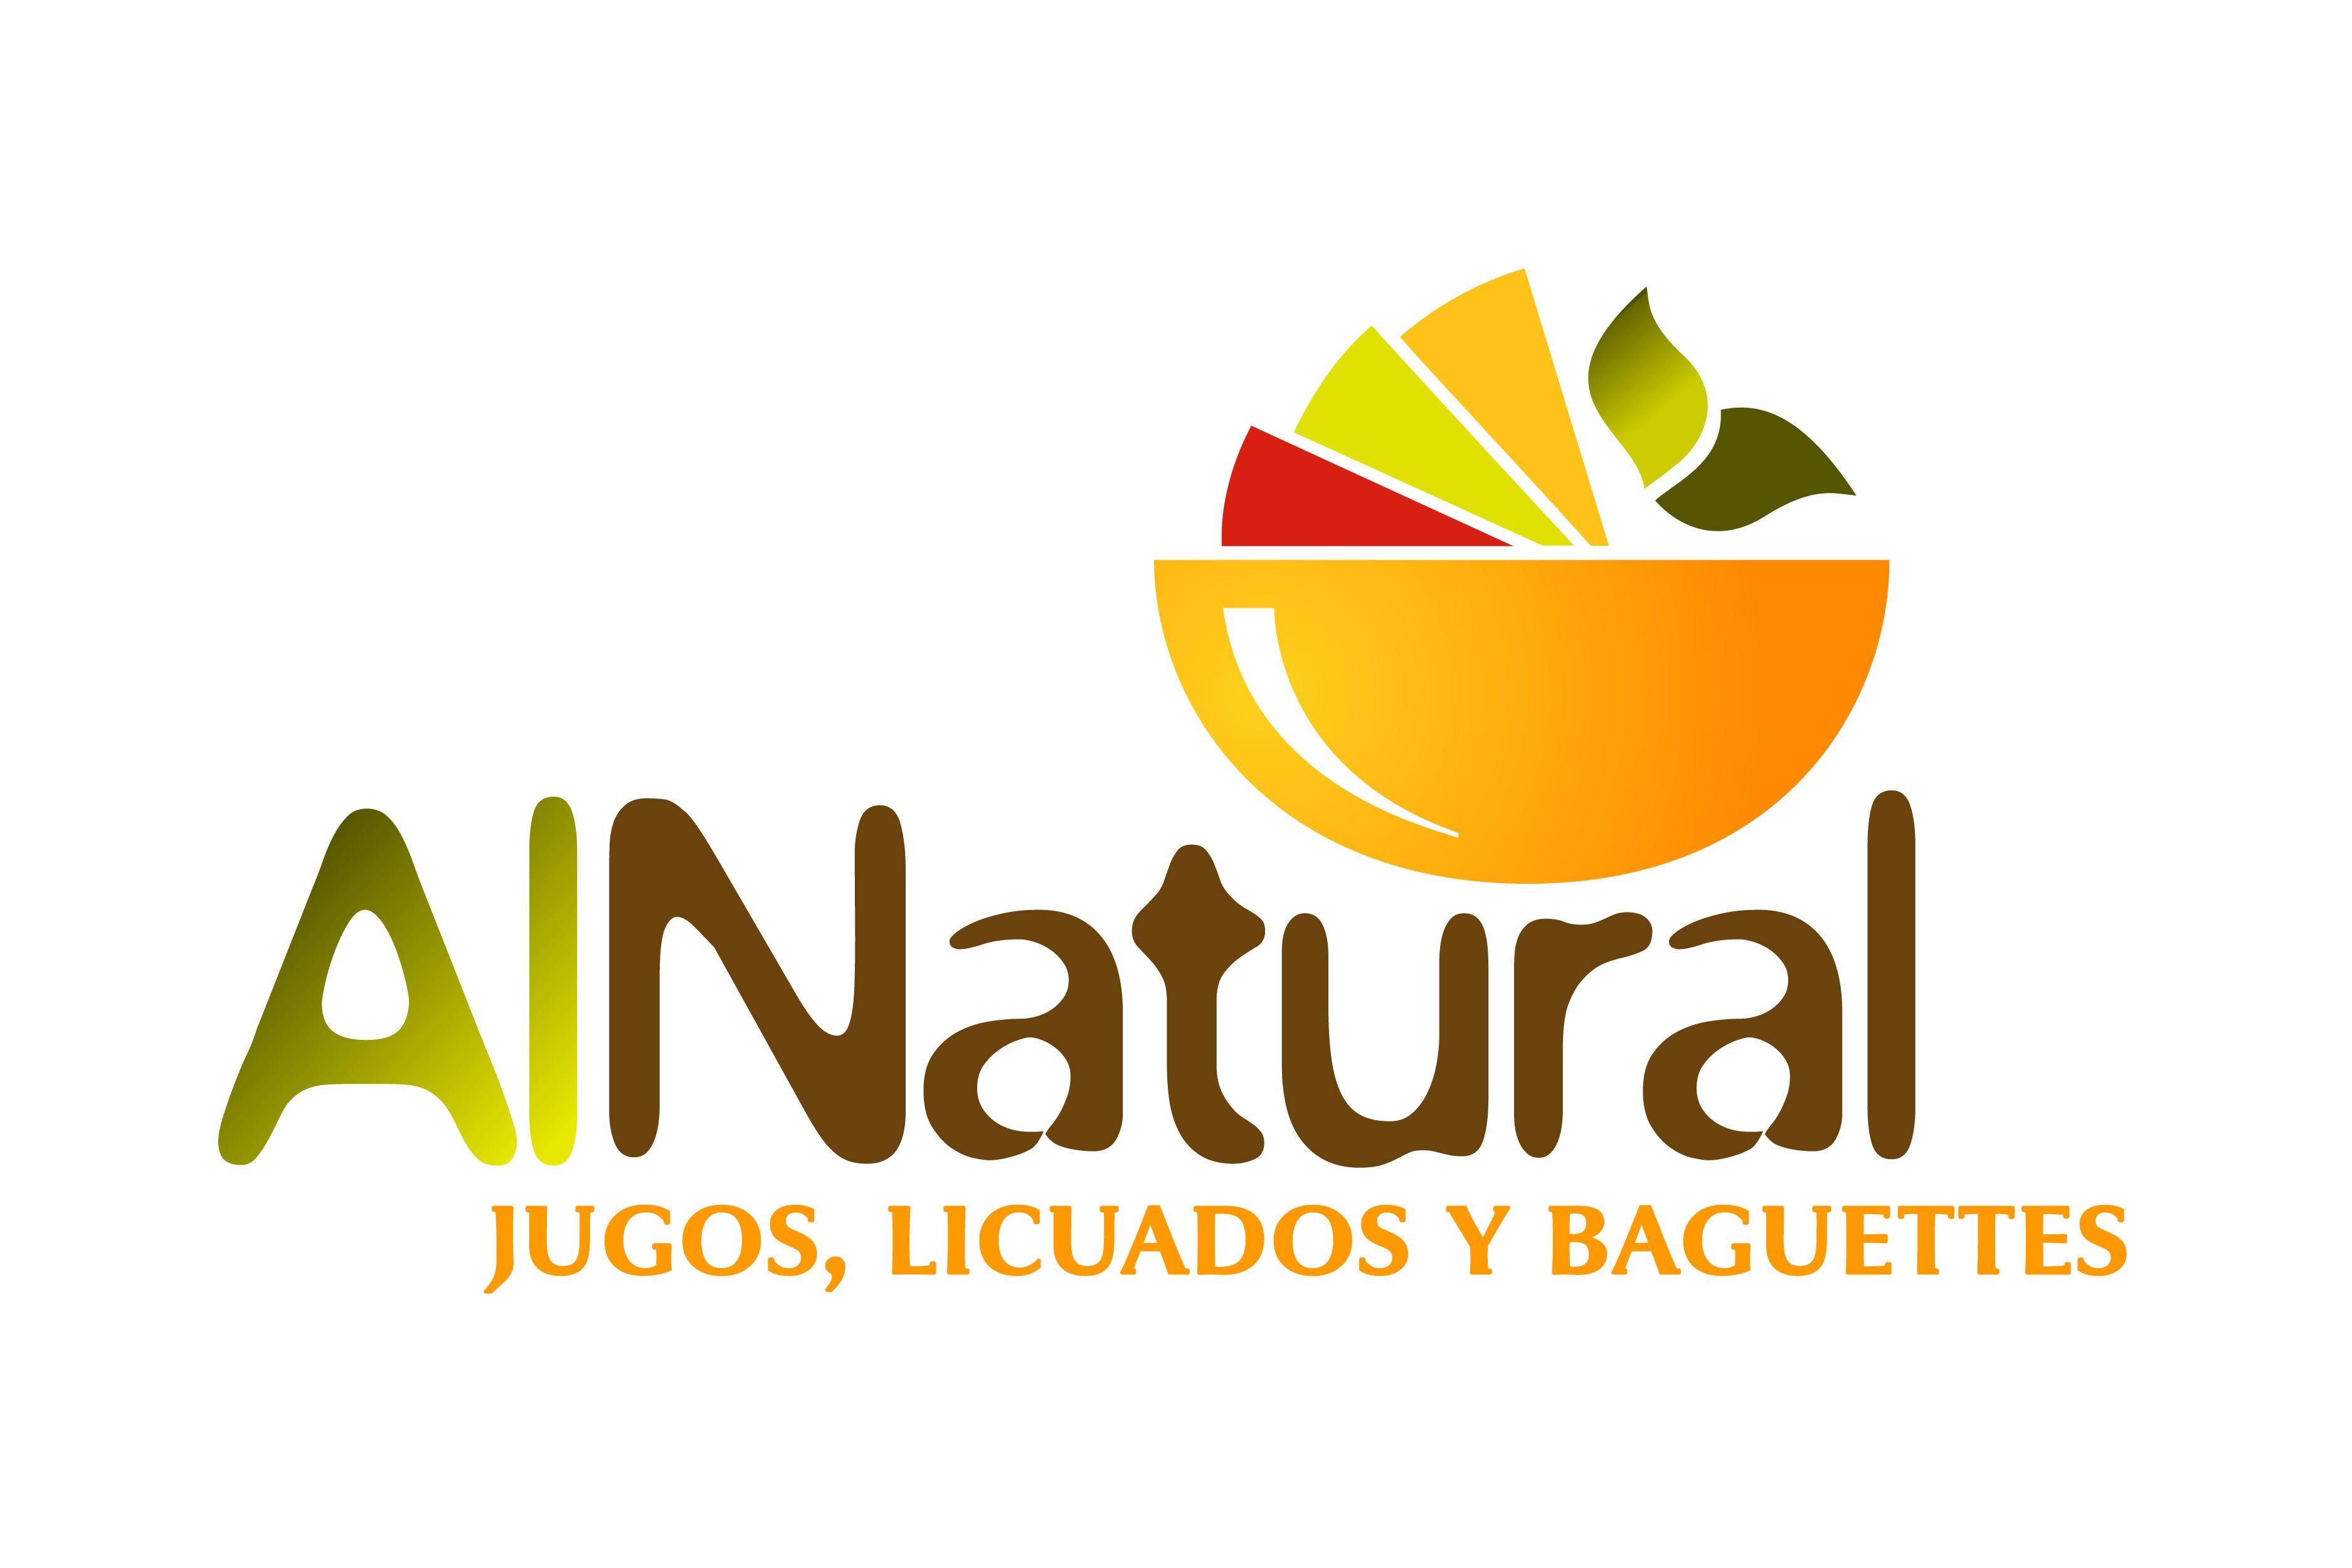 Logotipo de comida natural. Monterrey.  3b3a49de0bc32